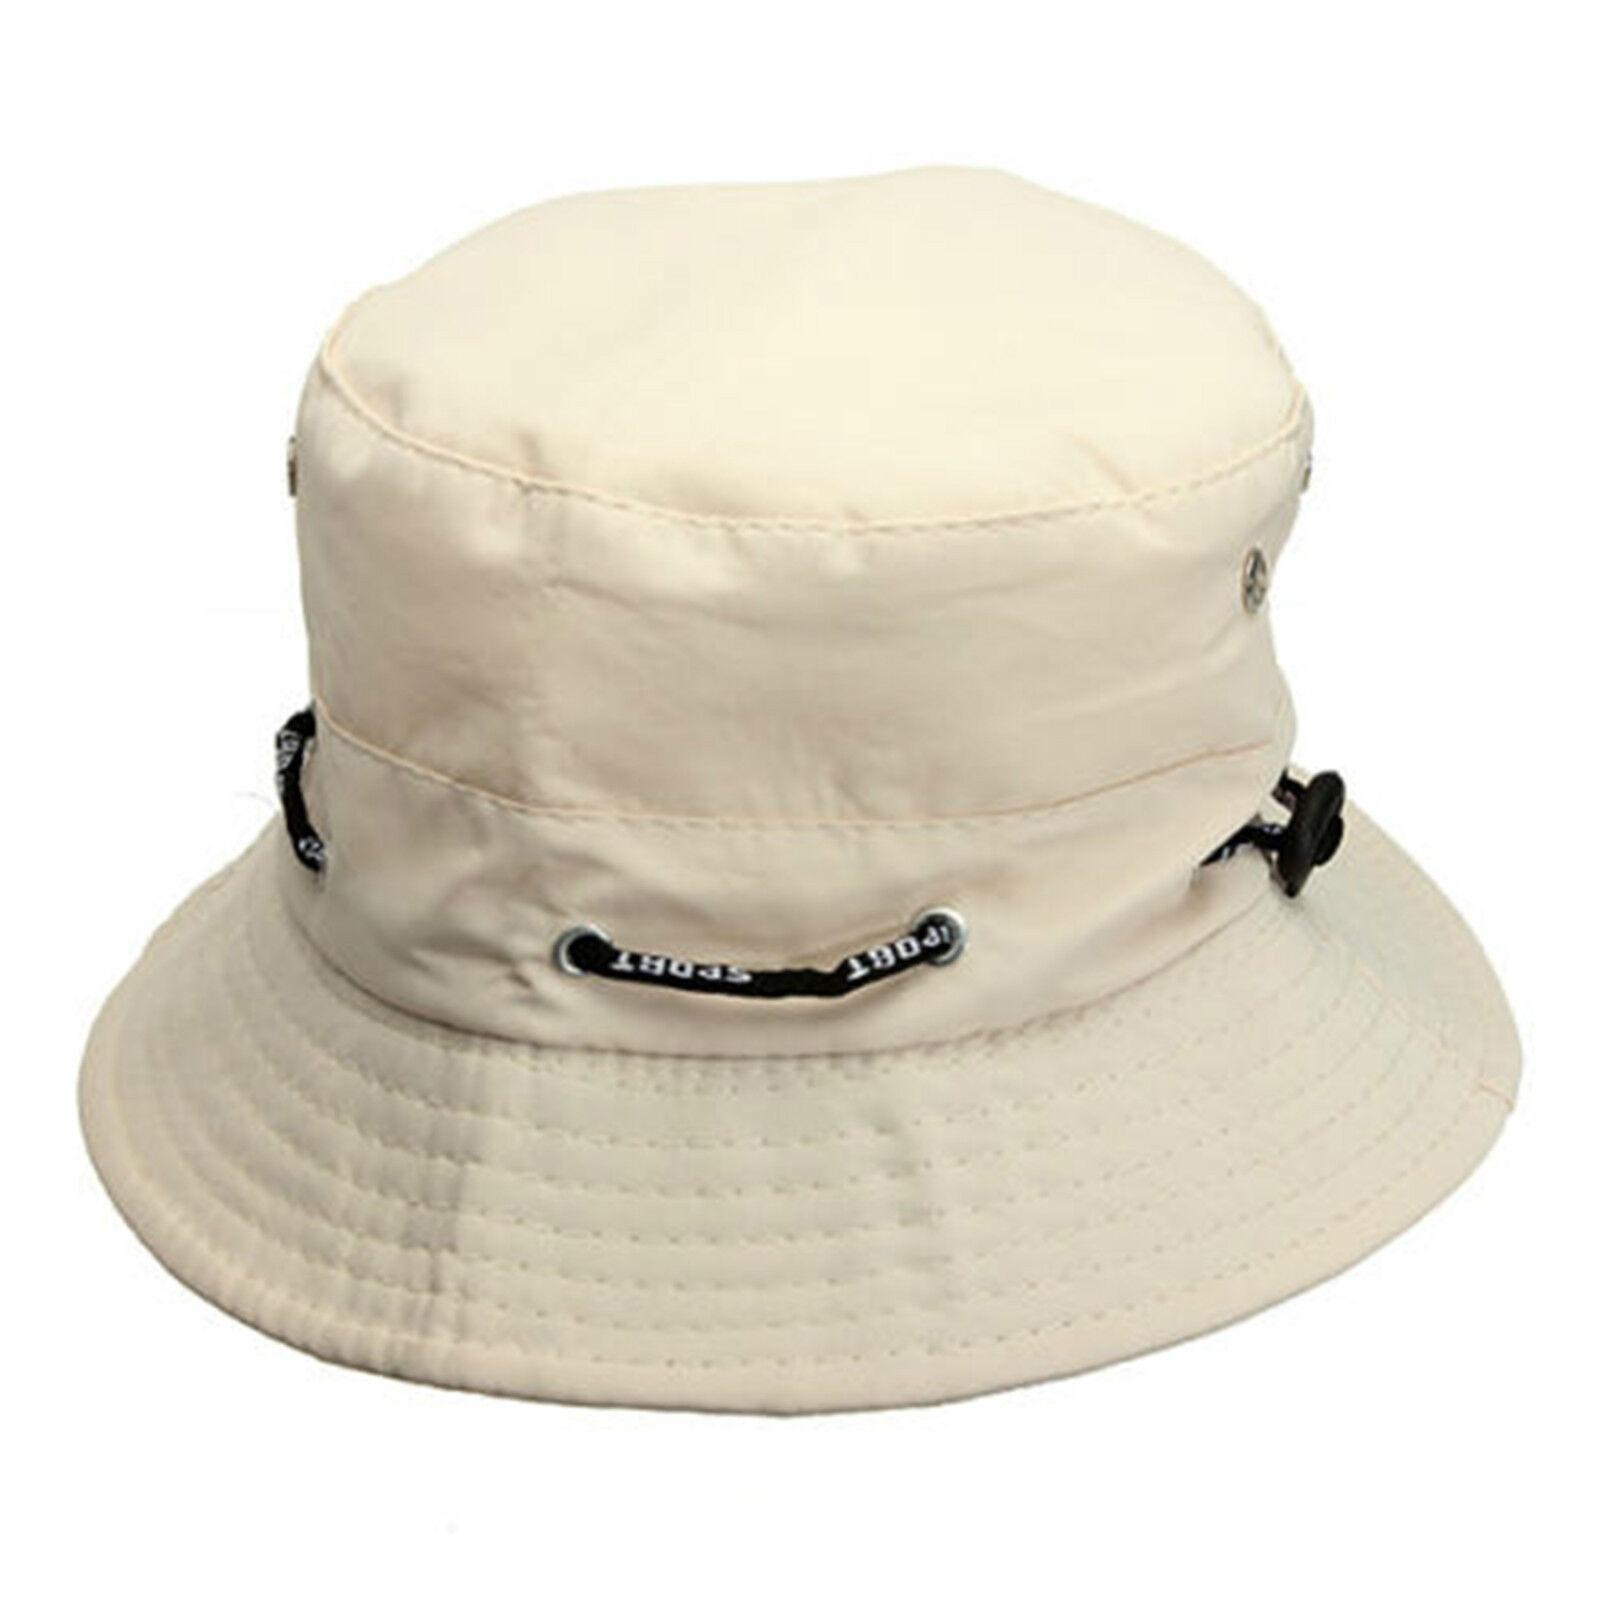 Unisex bucket hat hunting fishing outdoor cap mens summer sun hats jpg  1600x1600 Bucket fishing hats a9e39bdca30b